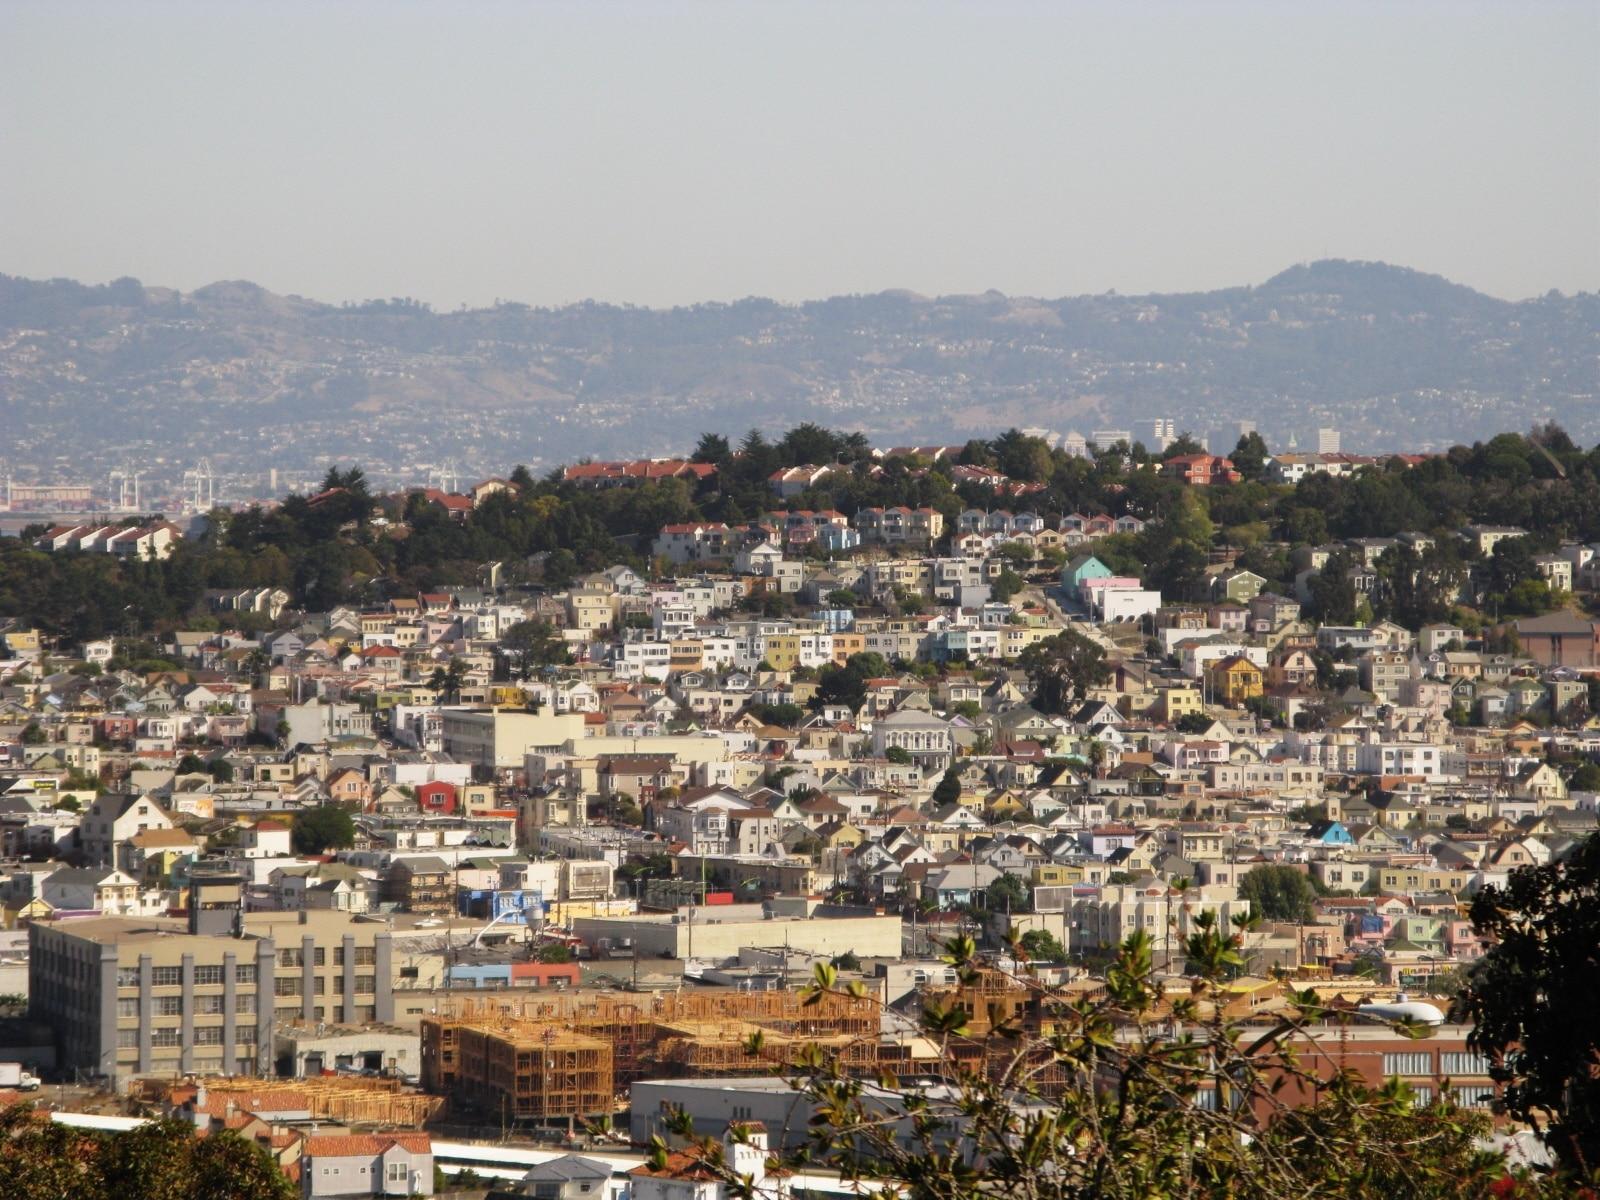 Central San Mateo, San Mateo, California, United States of America